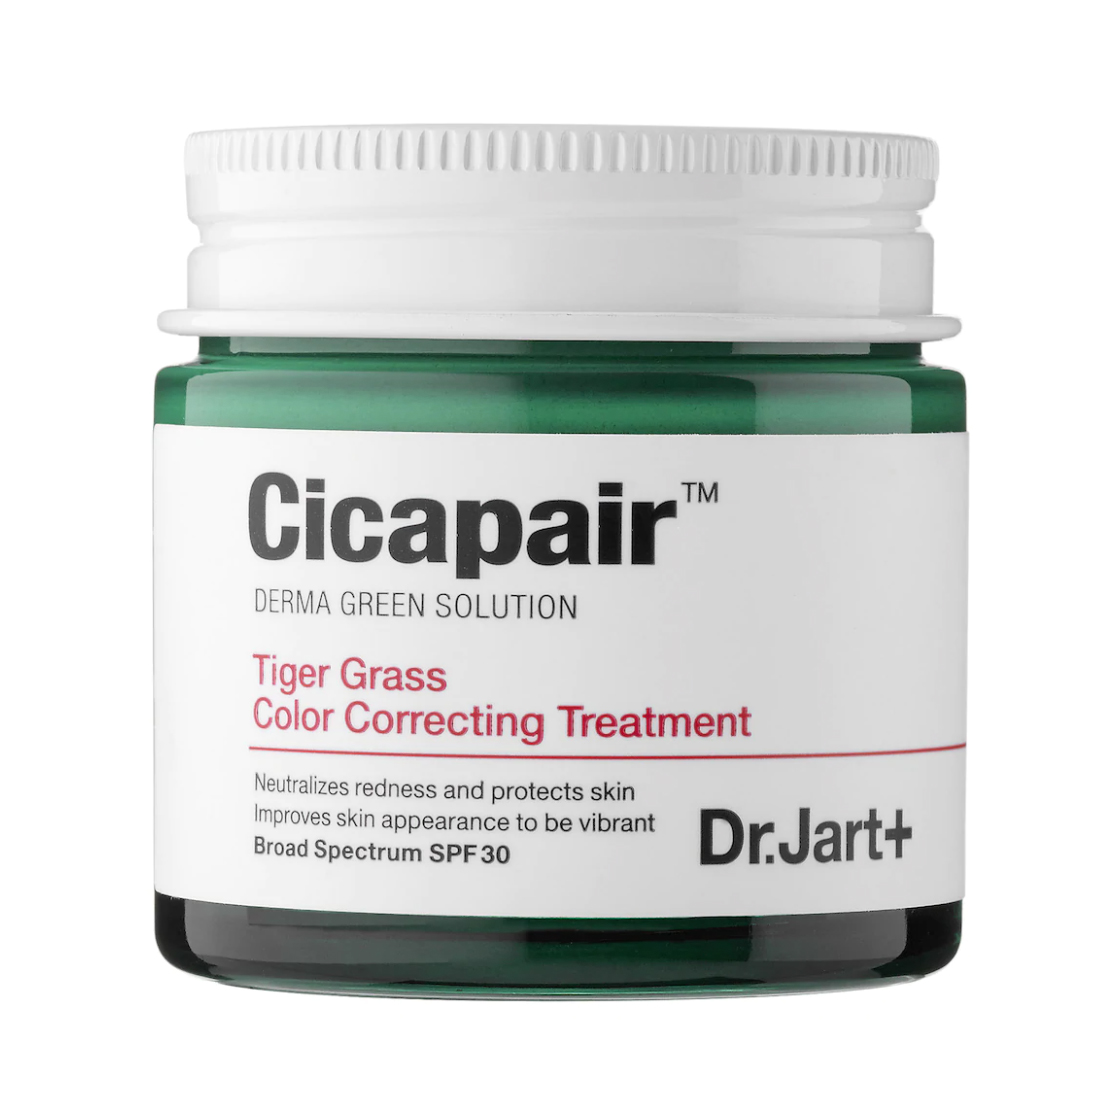 dr. jart+ CICAPAIR™ TIGER GRASS COLOR CORRECTING TREATMENT SPF30